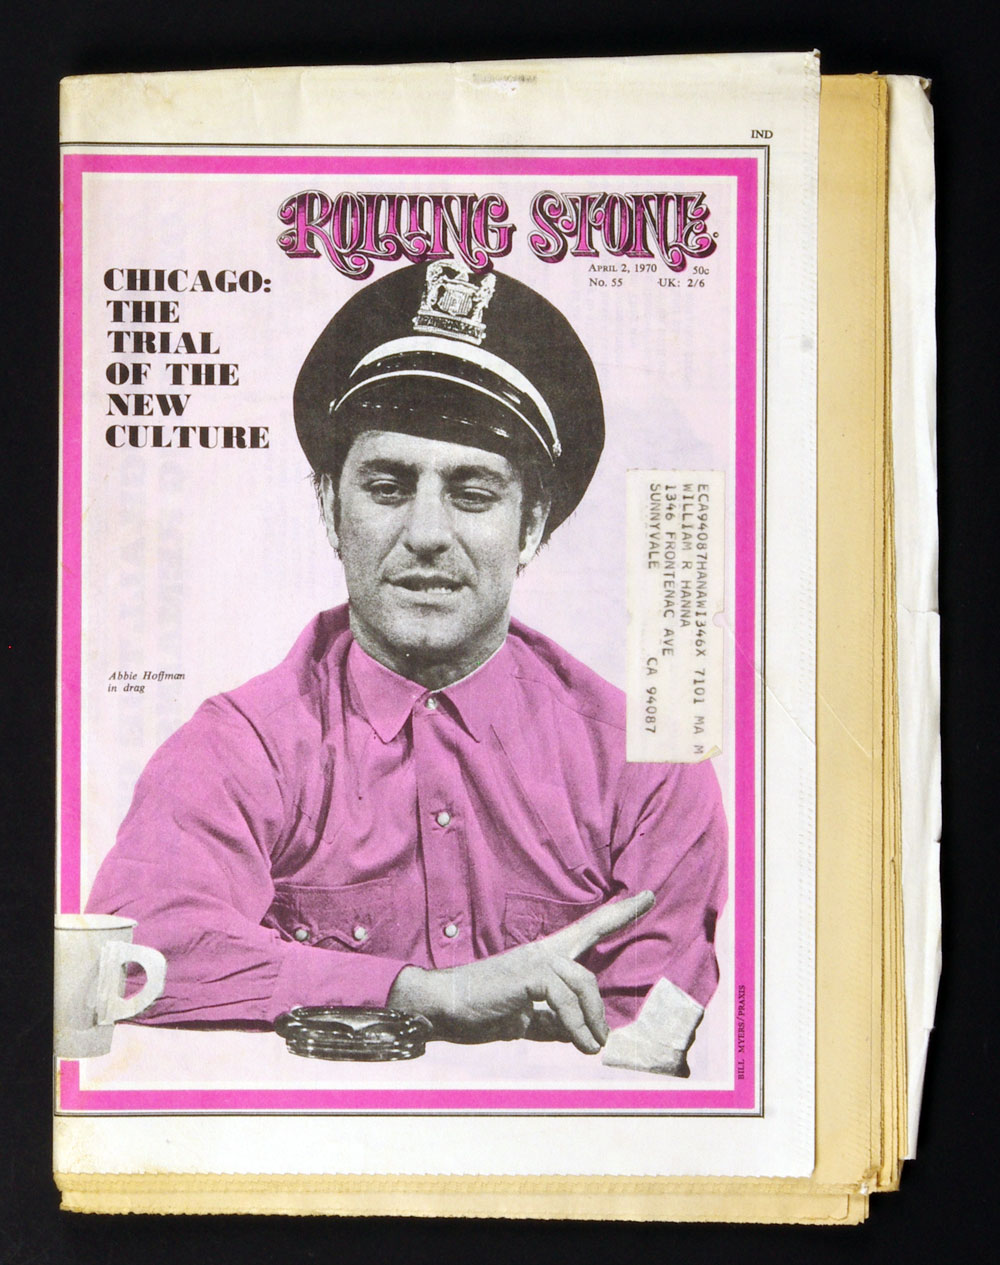 Rolling Stone Magazine 1970 Apr 2 No.55 Abbie Hoffman